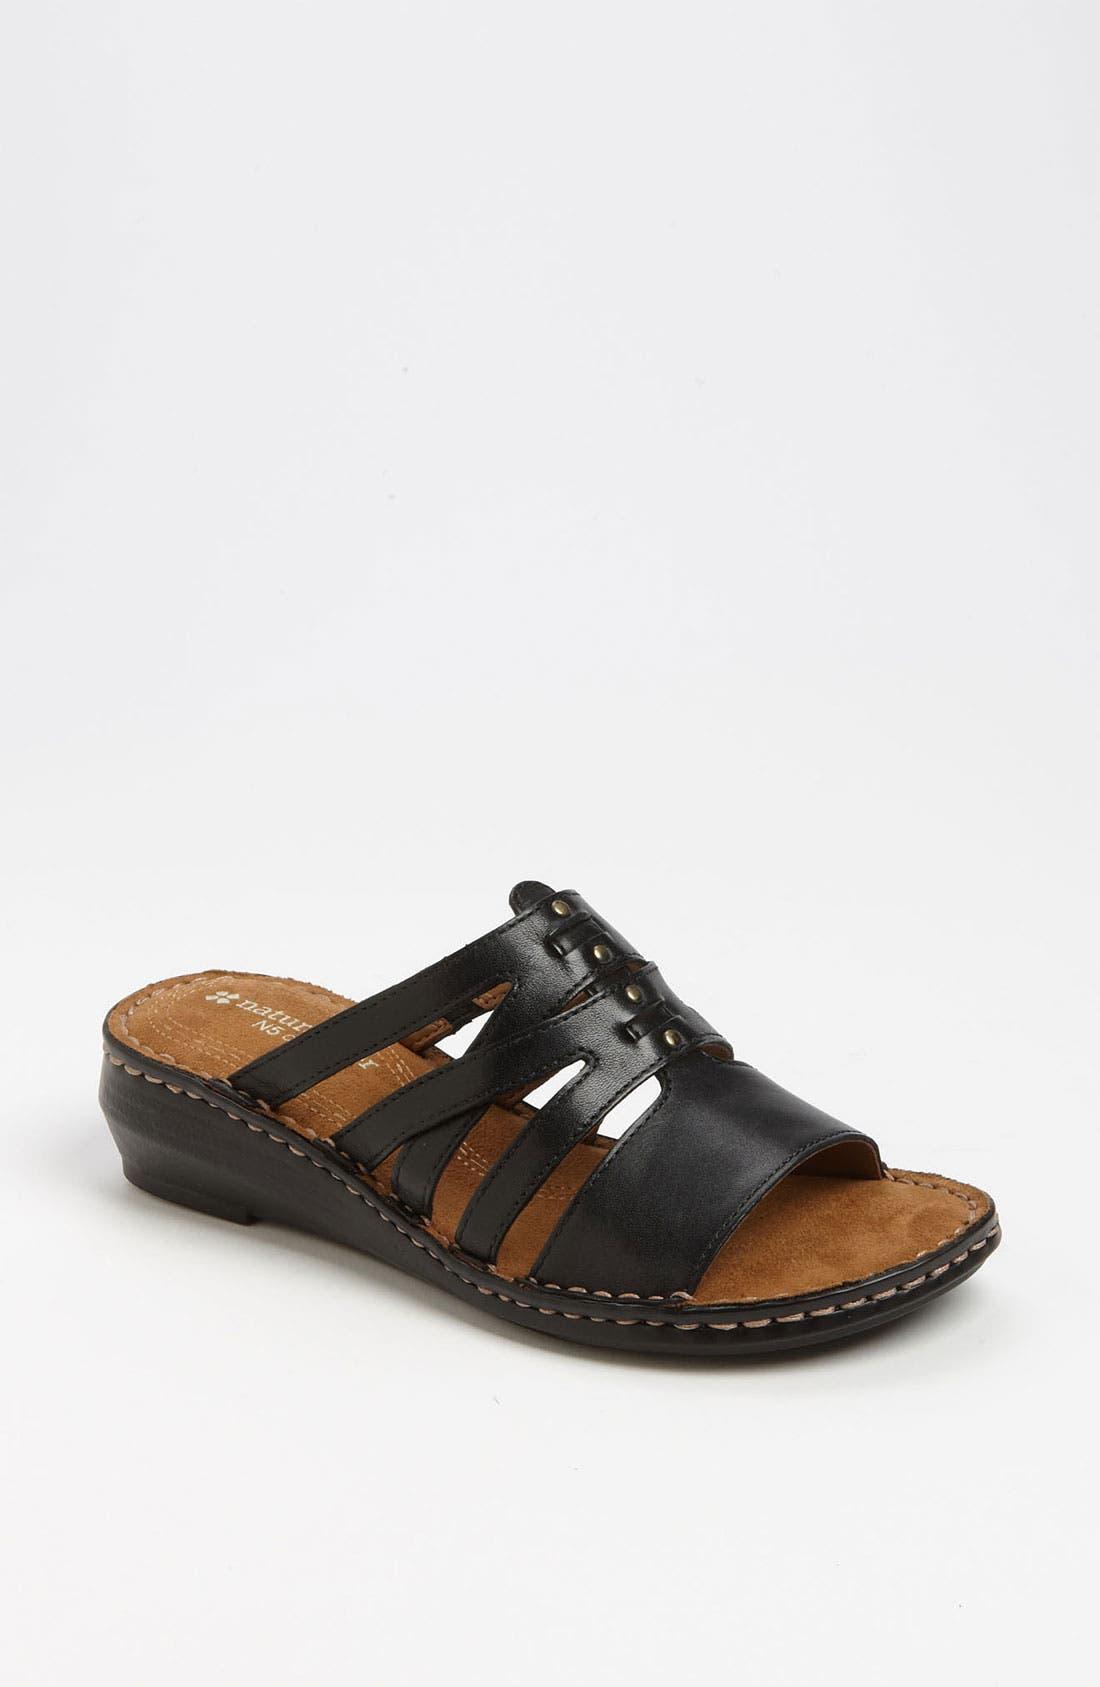 Alternate Image 1 Selected - Naturalizer 'Leanna' Sandal